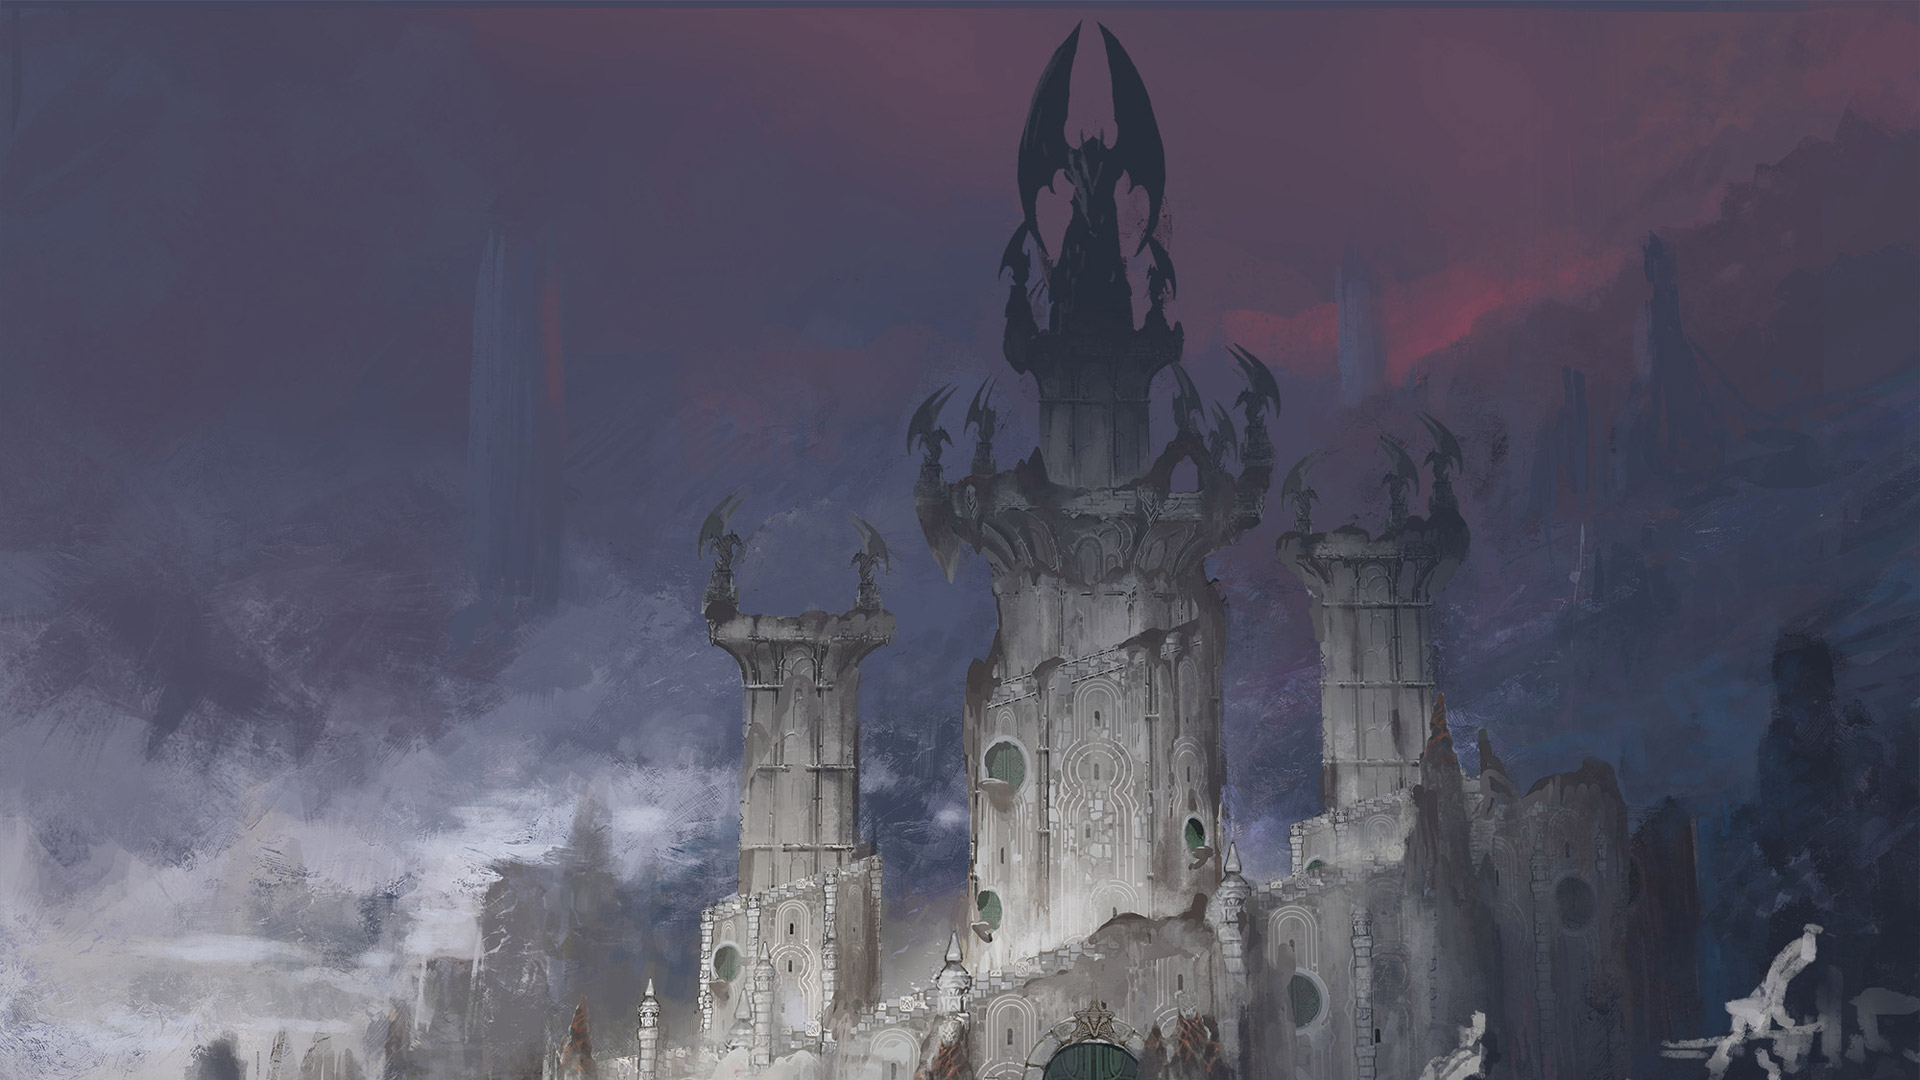 Free Final Fantasy XIV Wallpaper in 1920x1080